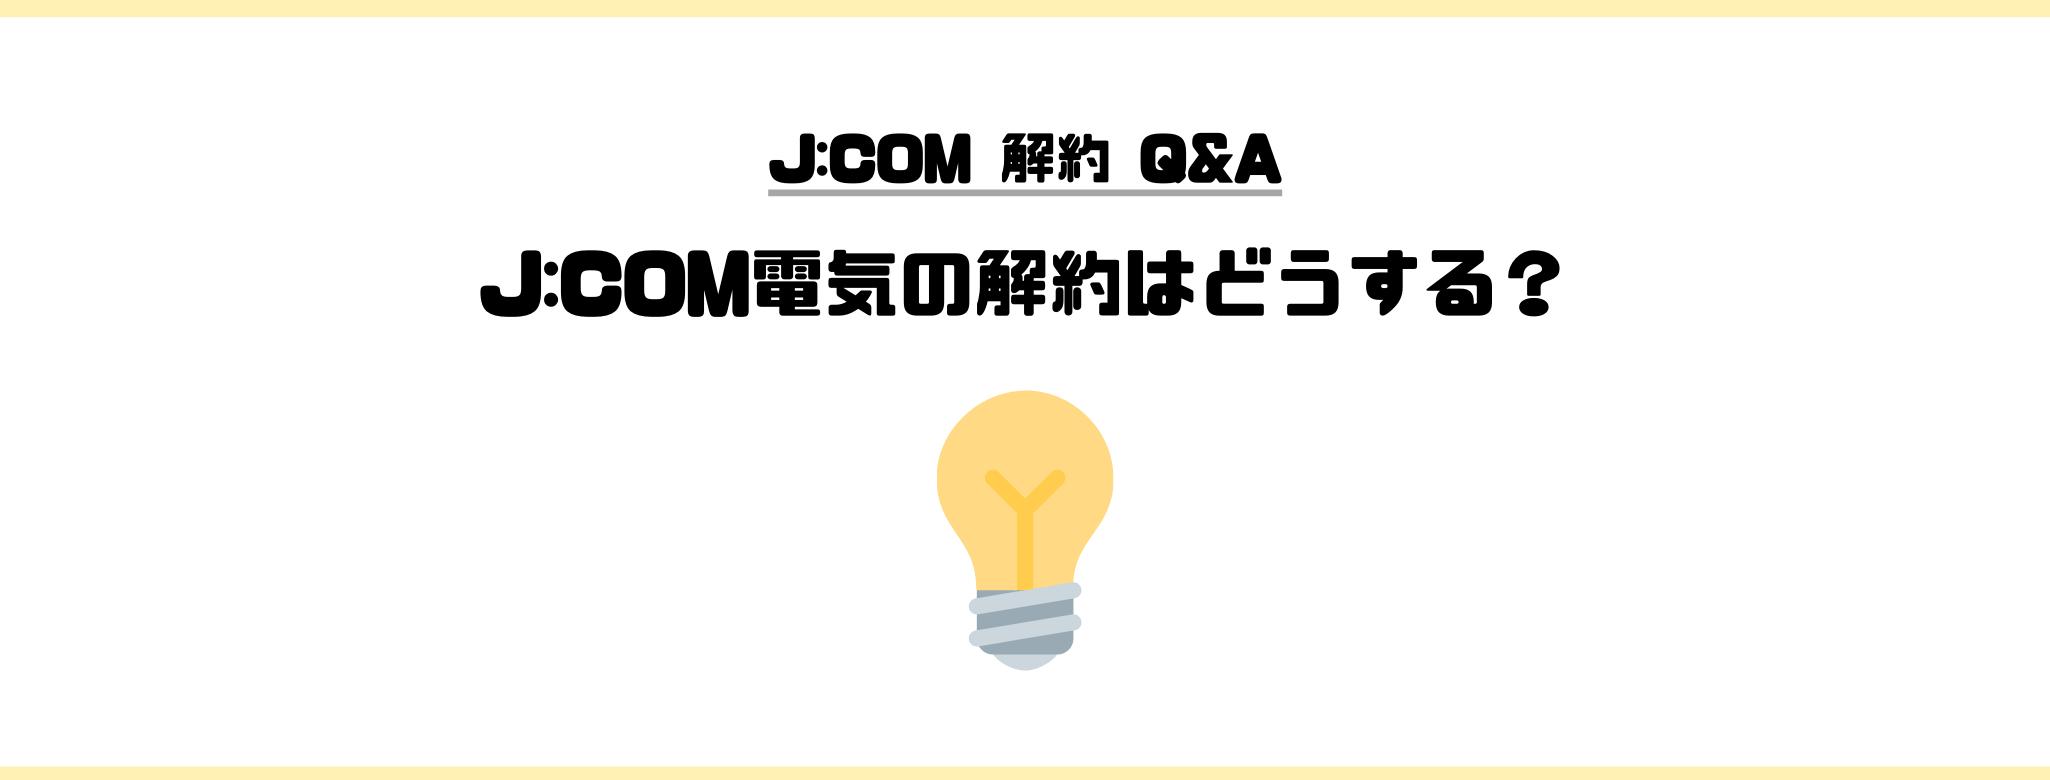 J:COM_解約_電気_電力